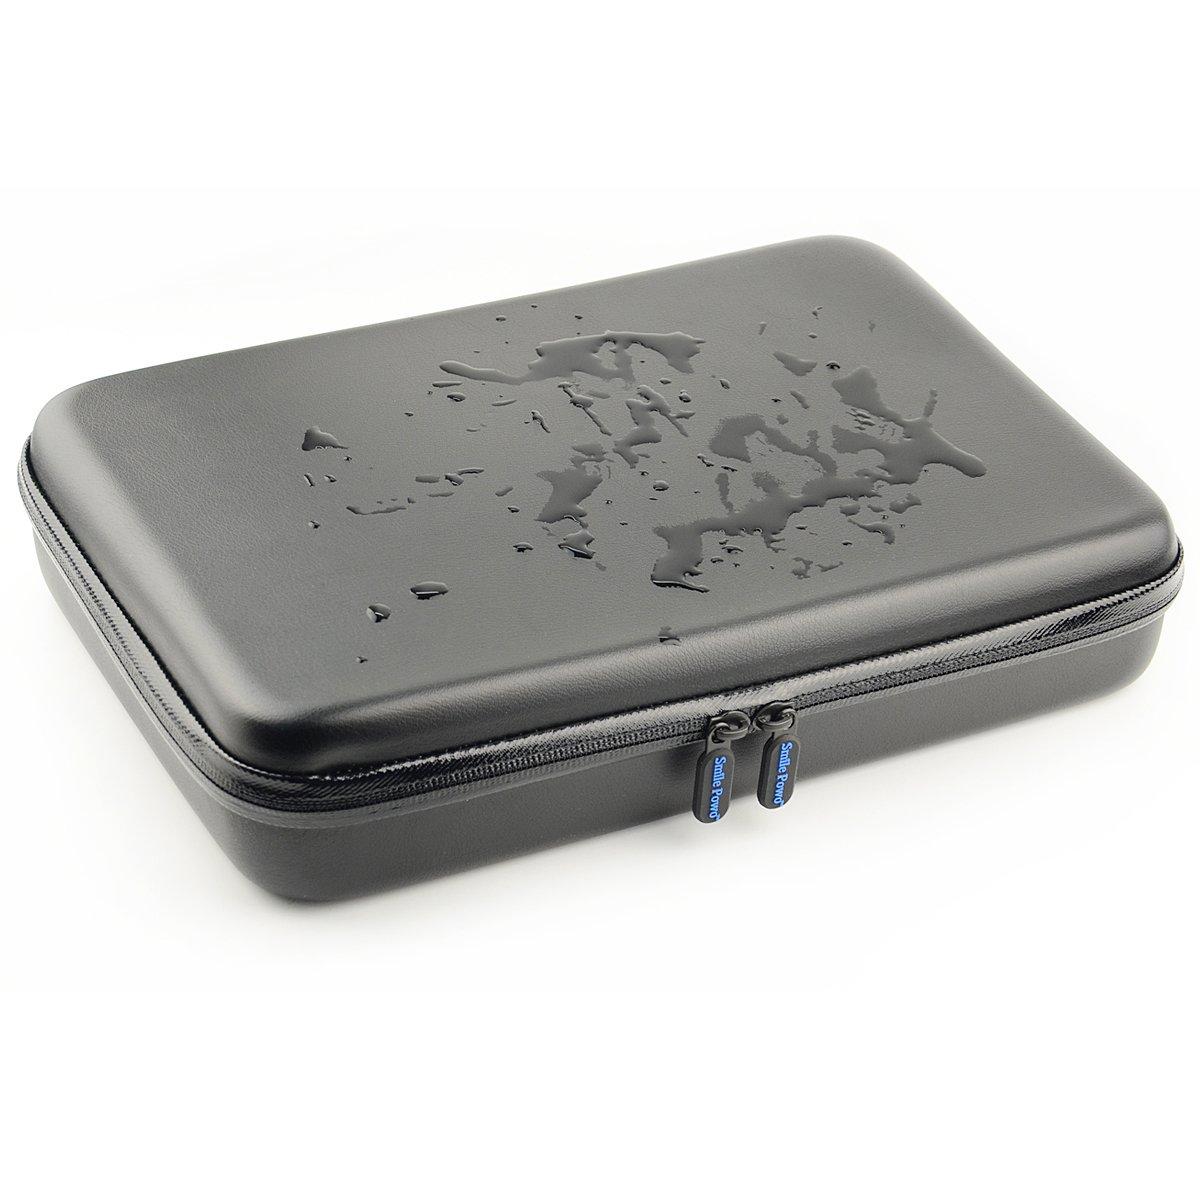 SmilePowo Portable Travel Gopro Bag Carrying Case for AKASO EK5000 EK7000 Action Camera Gopro Hero 6, 5, 4, 3+, 3, 2, 1 Accessories and Waterproof